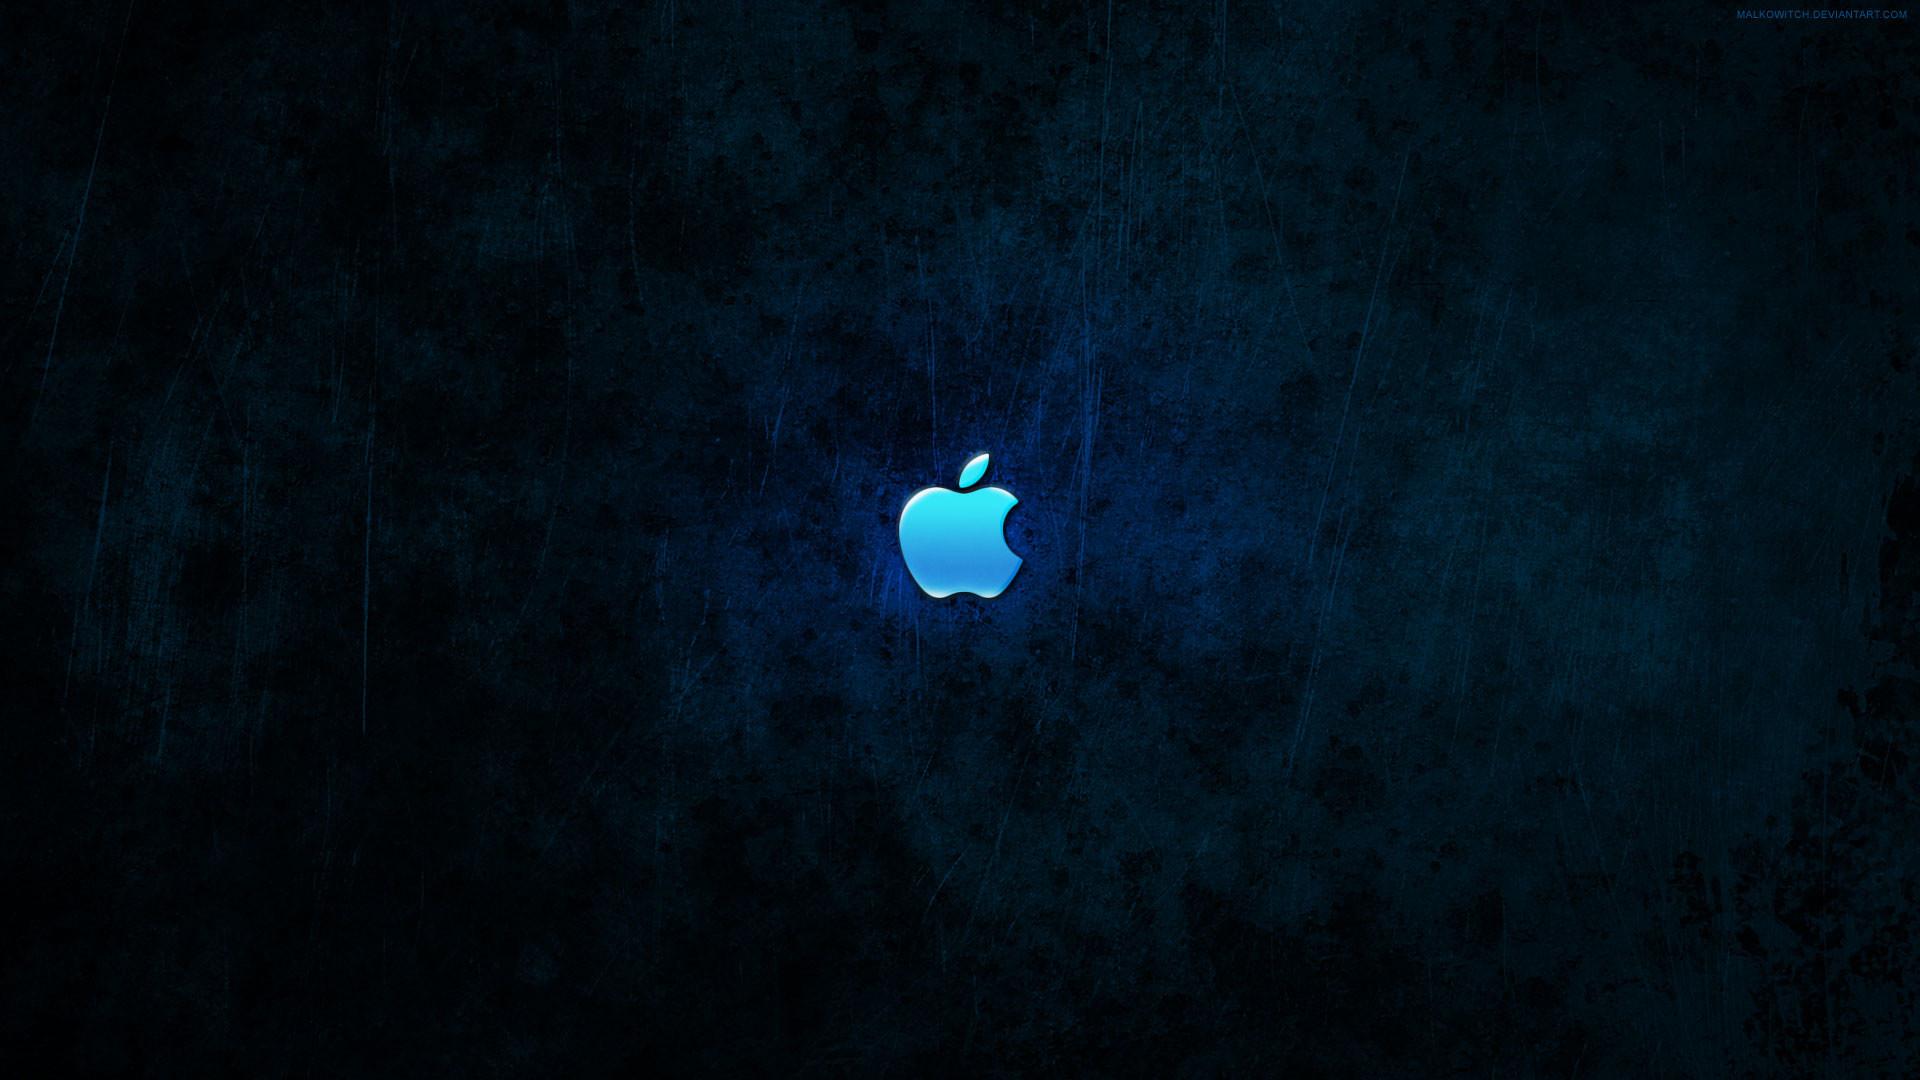 hd pics photos blue dark apple logo desktop background wallpaper